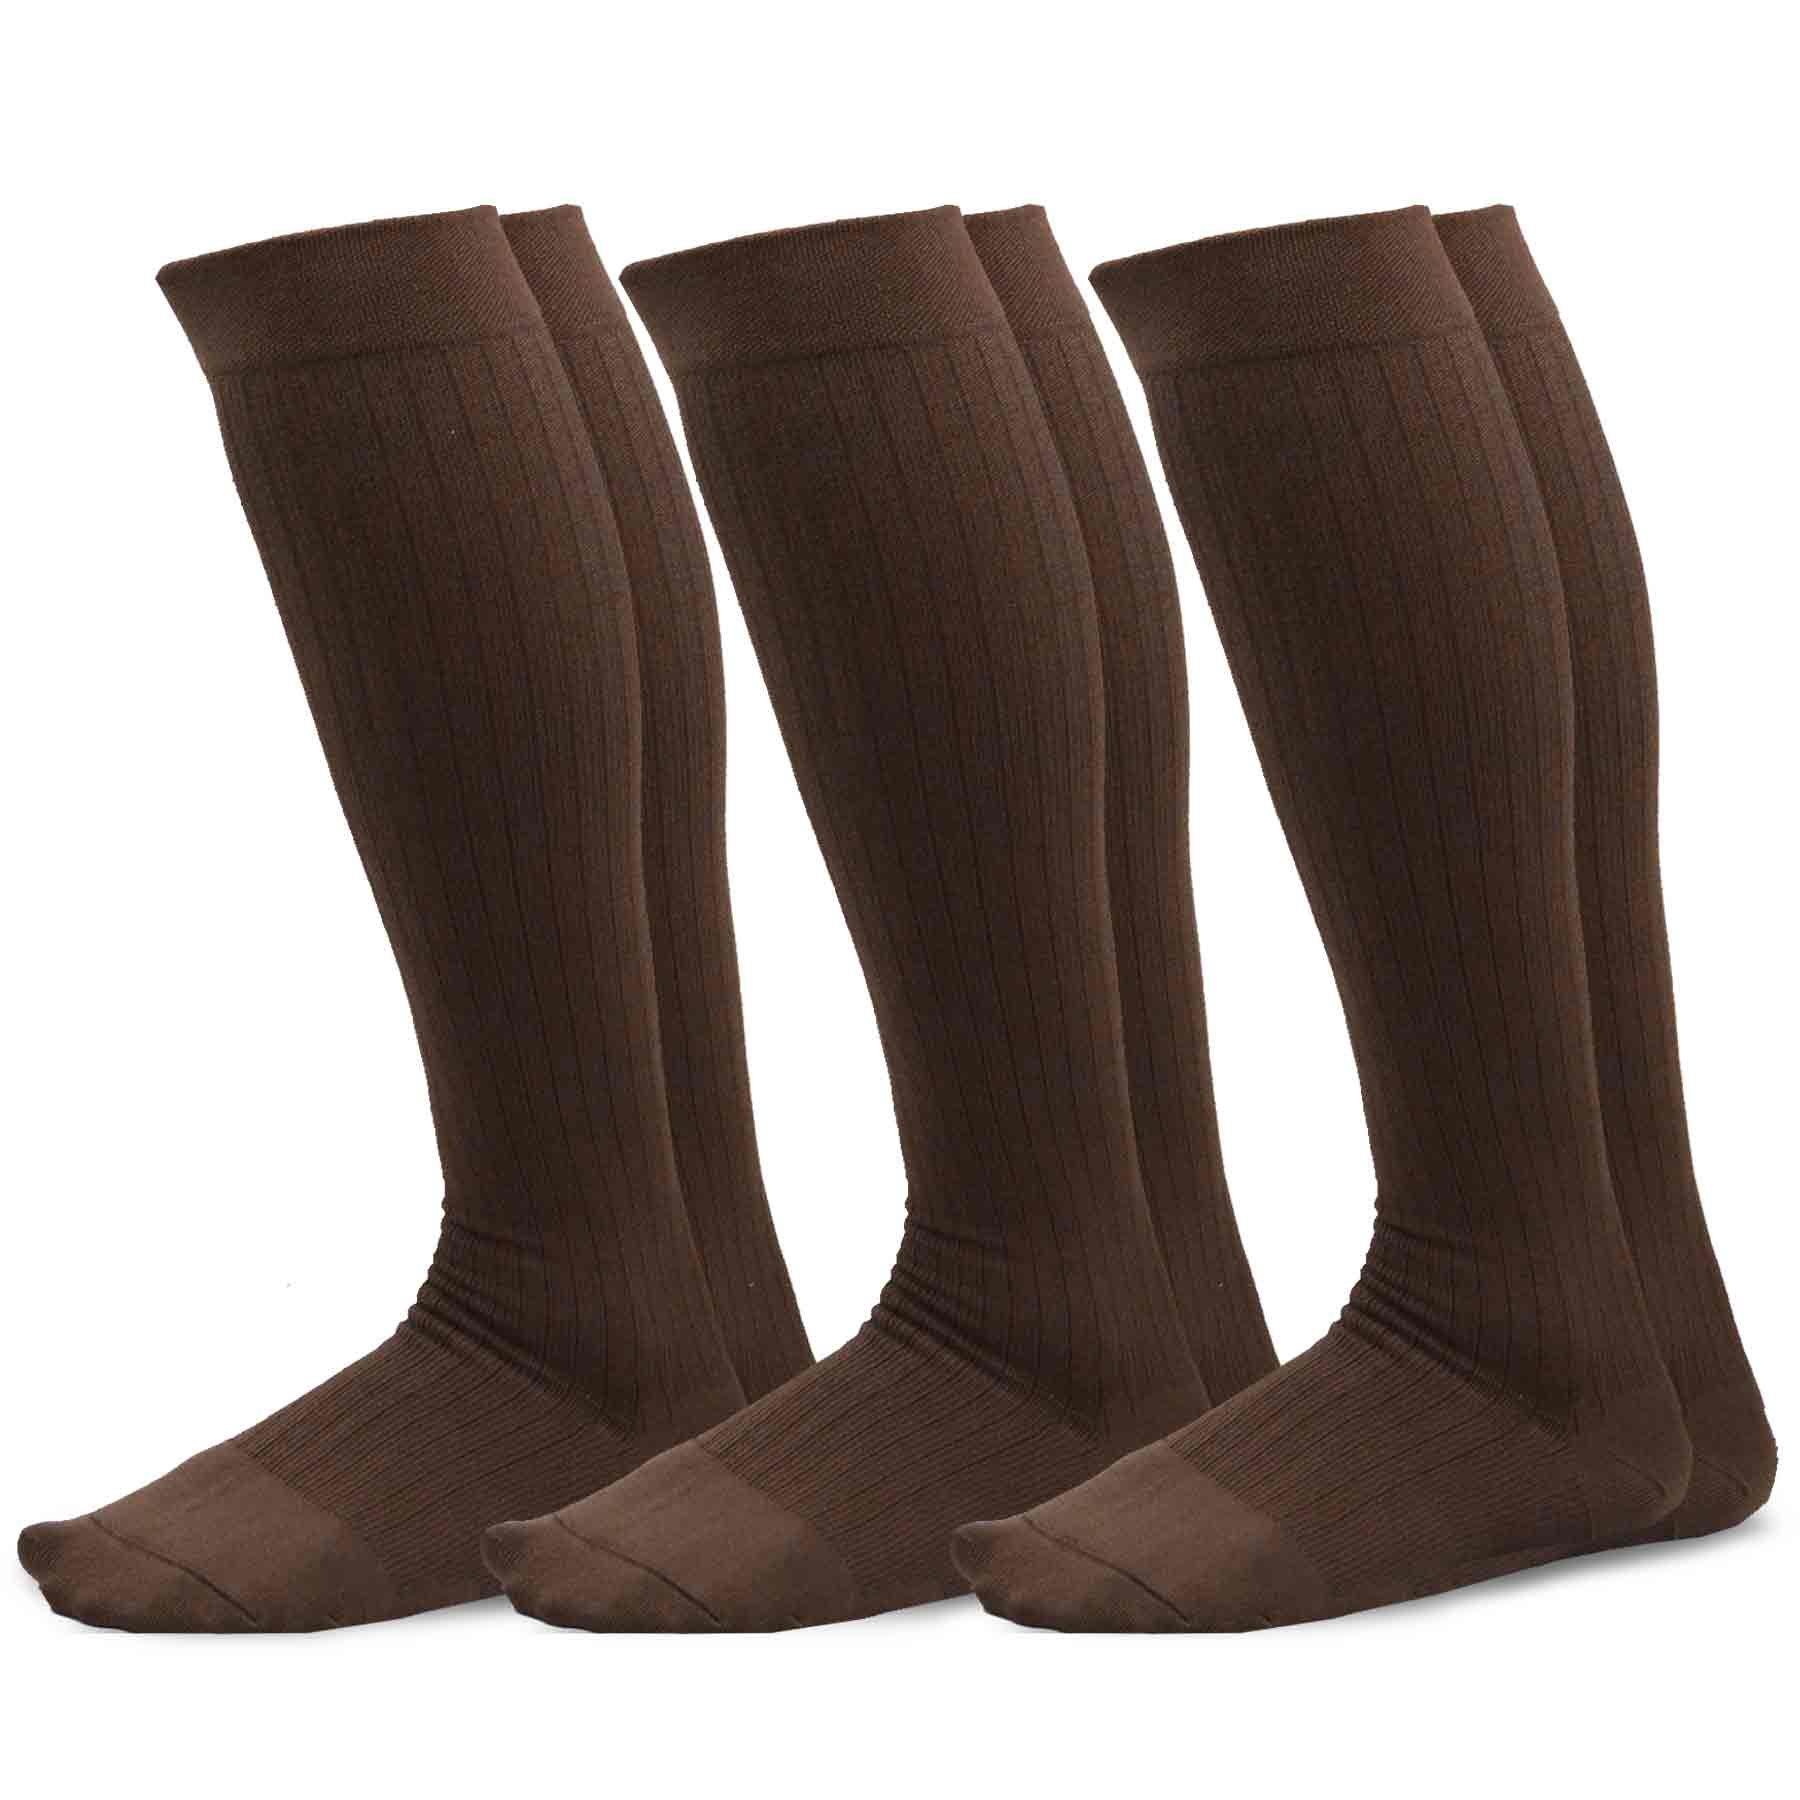 TeeHee Microfiber Compression Knee High Socks with Rib 3-Pack (Small (8-9), Brown)